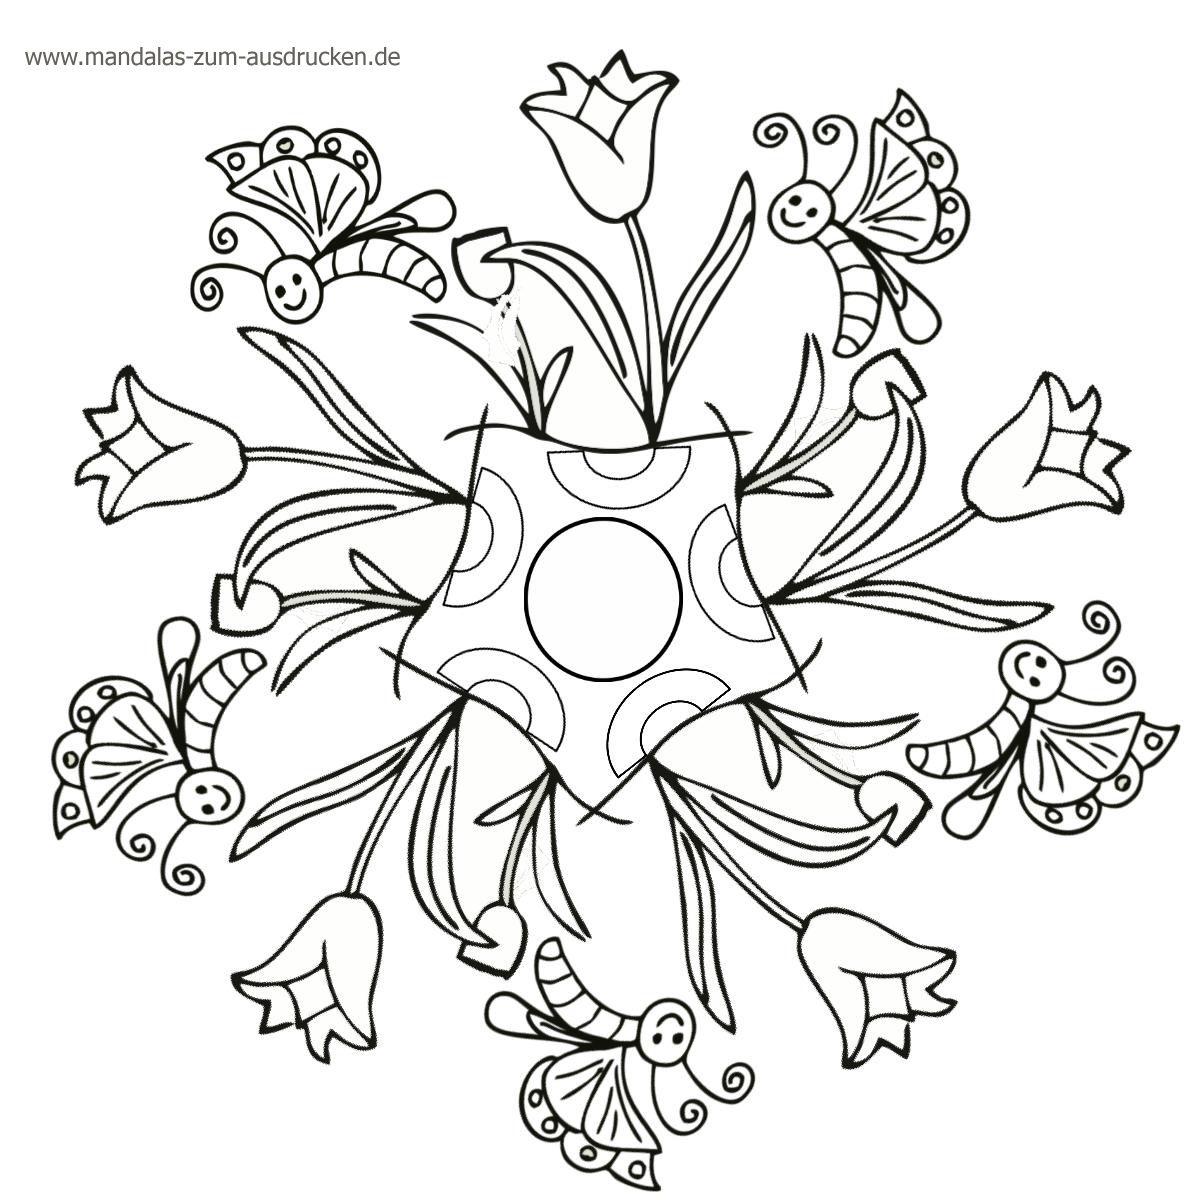 ausmalbilder mandala schmetterling 09 | Basteln | Pinterest ...